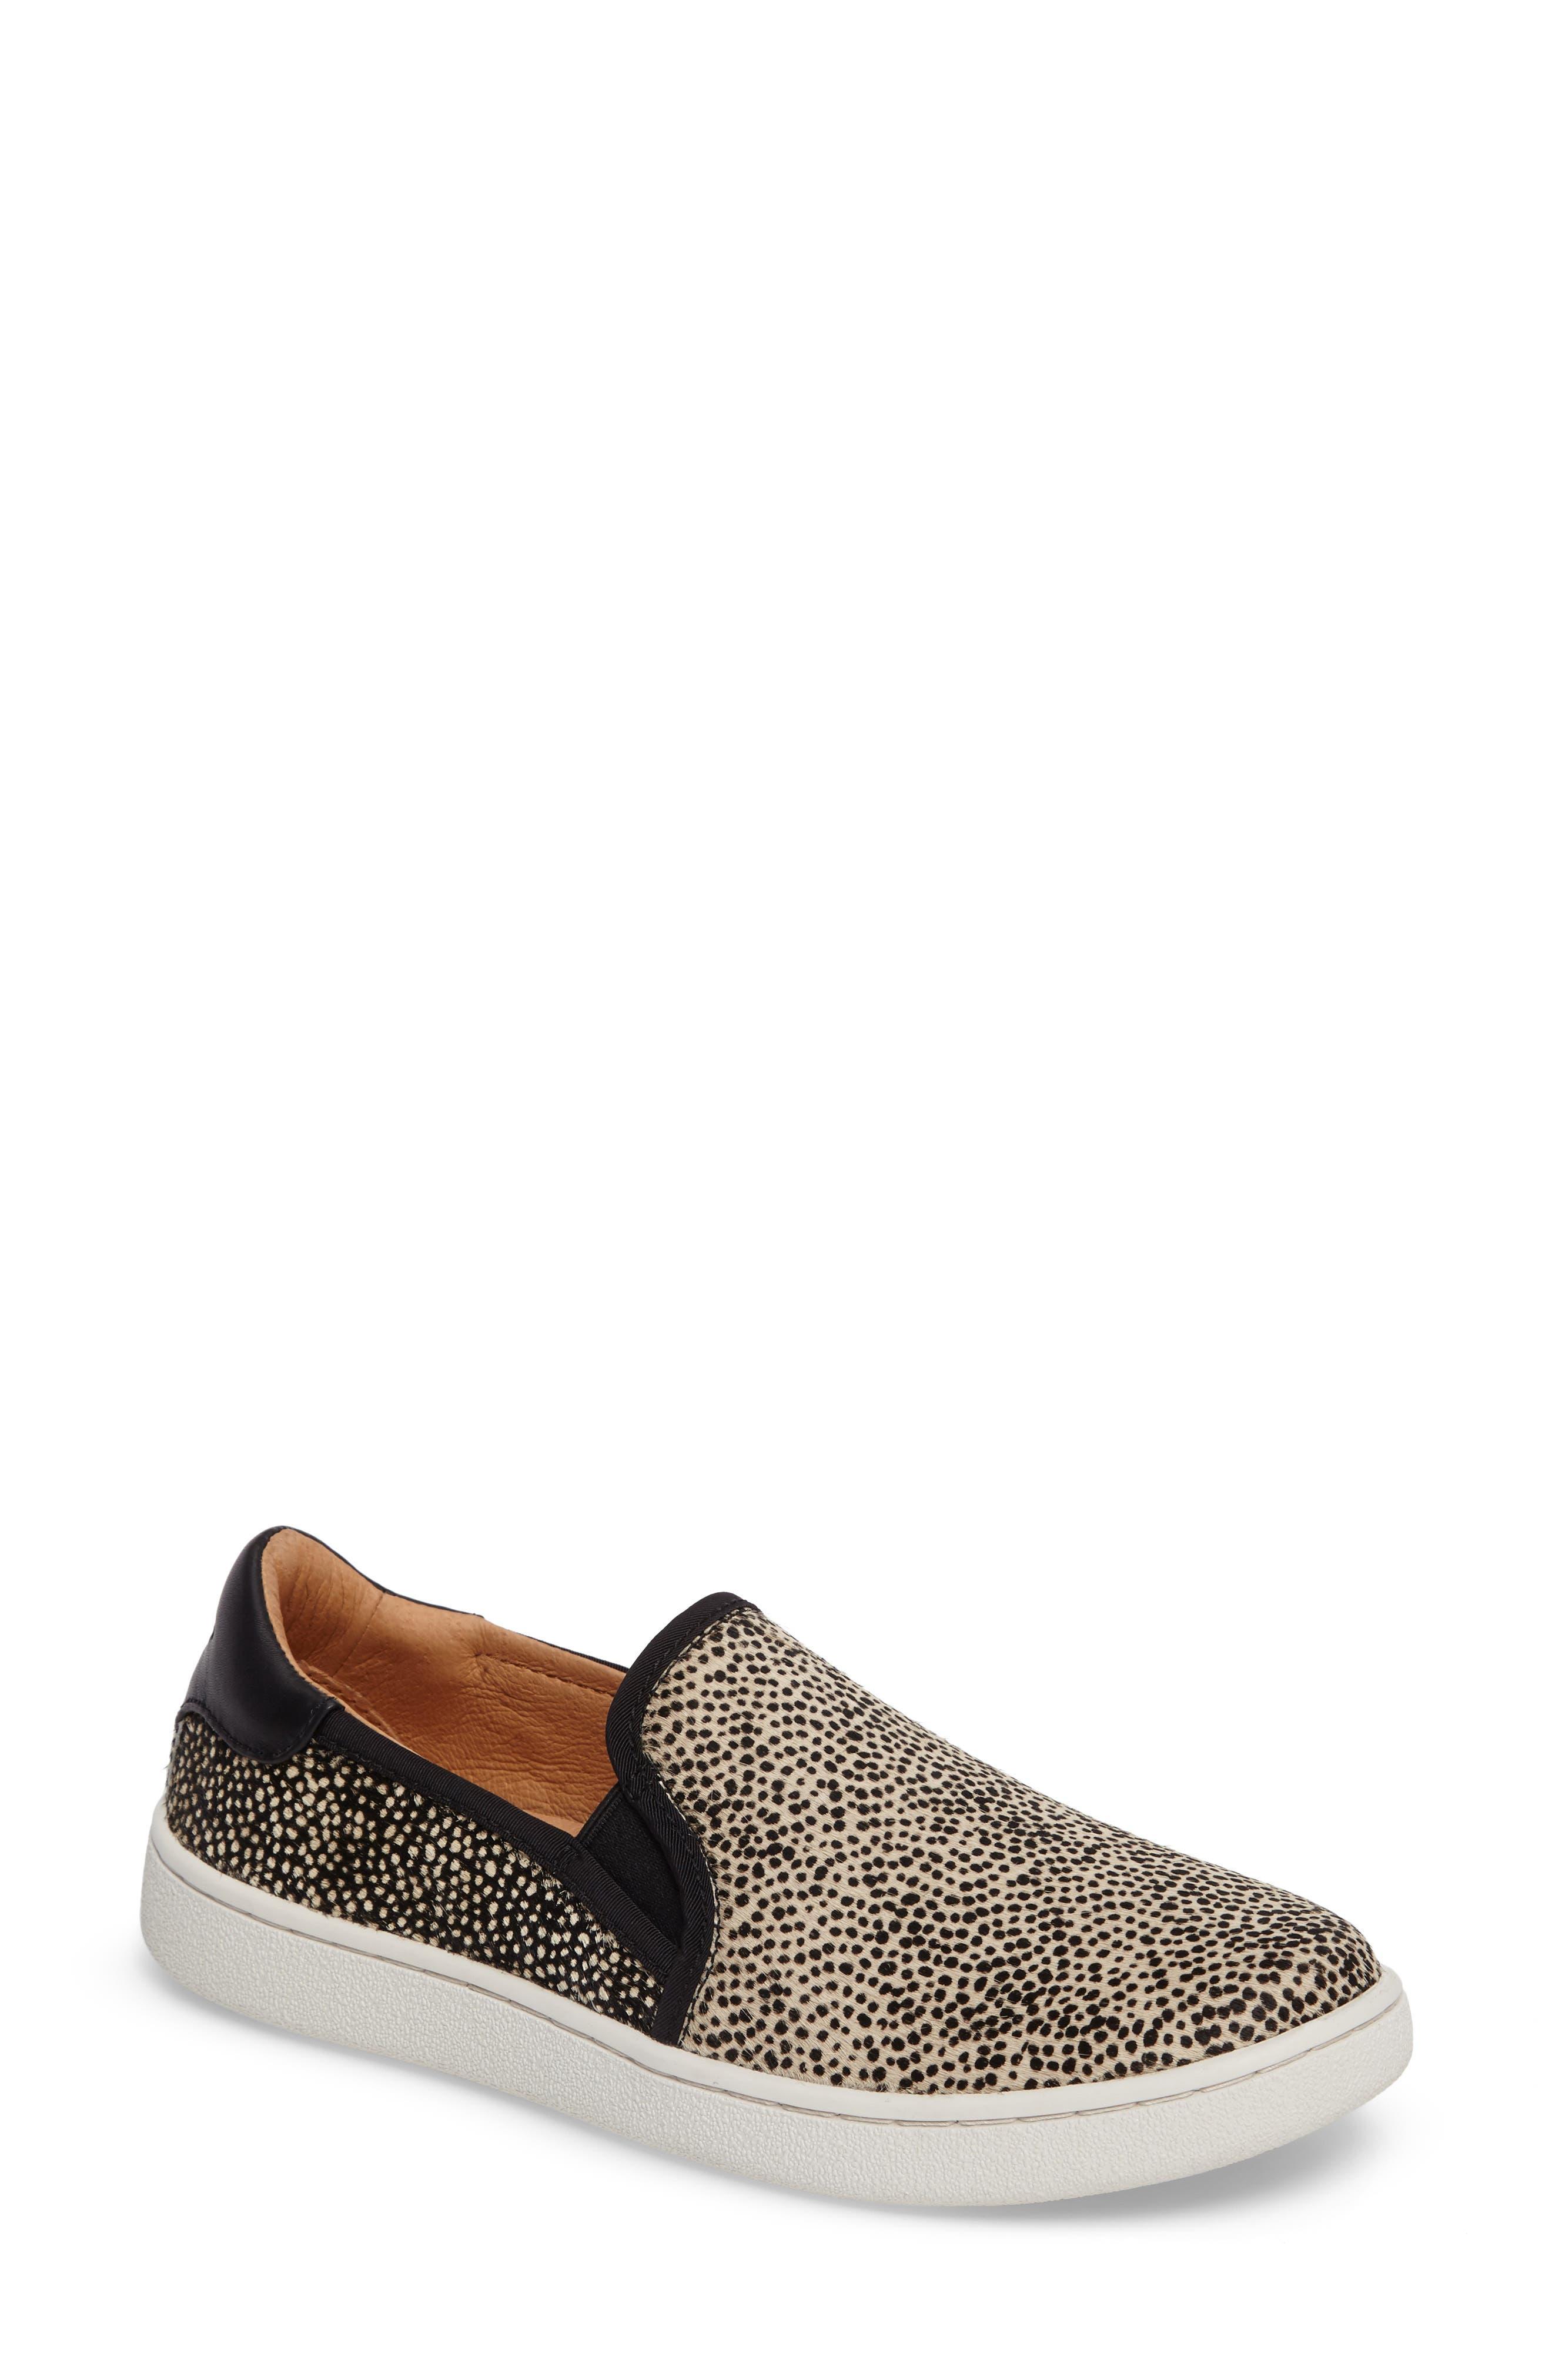 Alternate Image 1 Selected - UGG® Cas Exotic Genuine Calf Hair Slip-On Sneaker (Women)